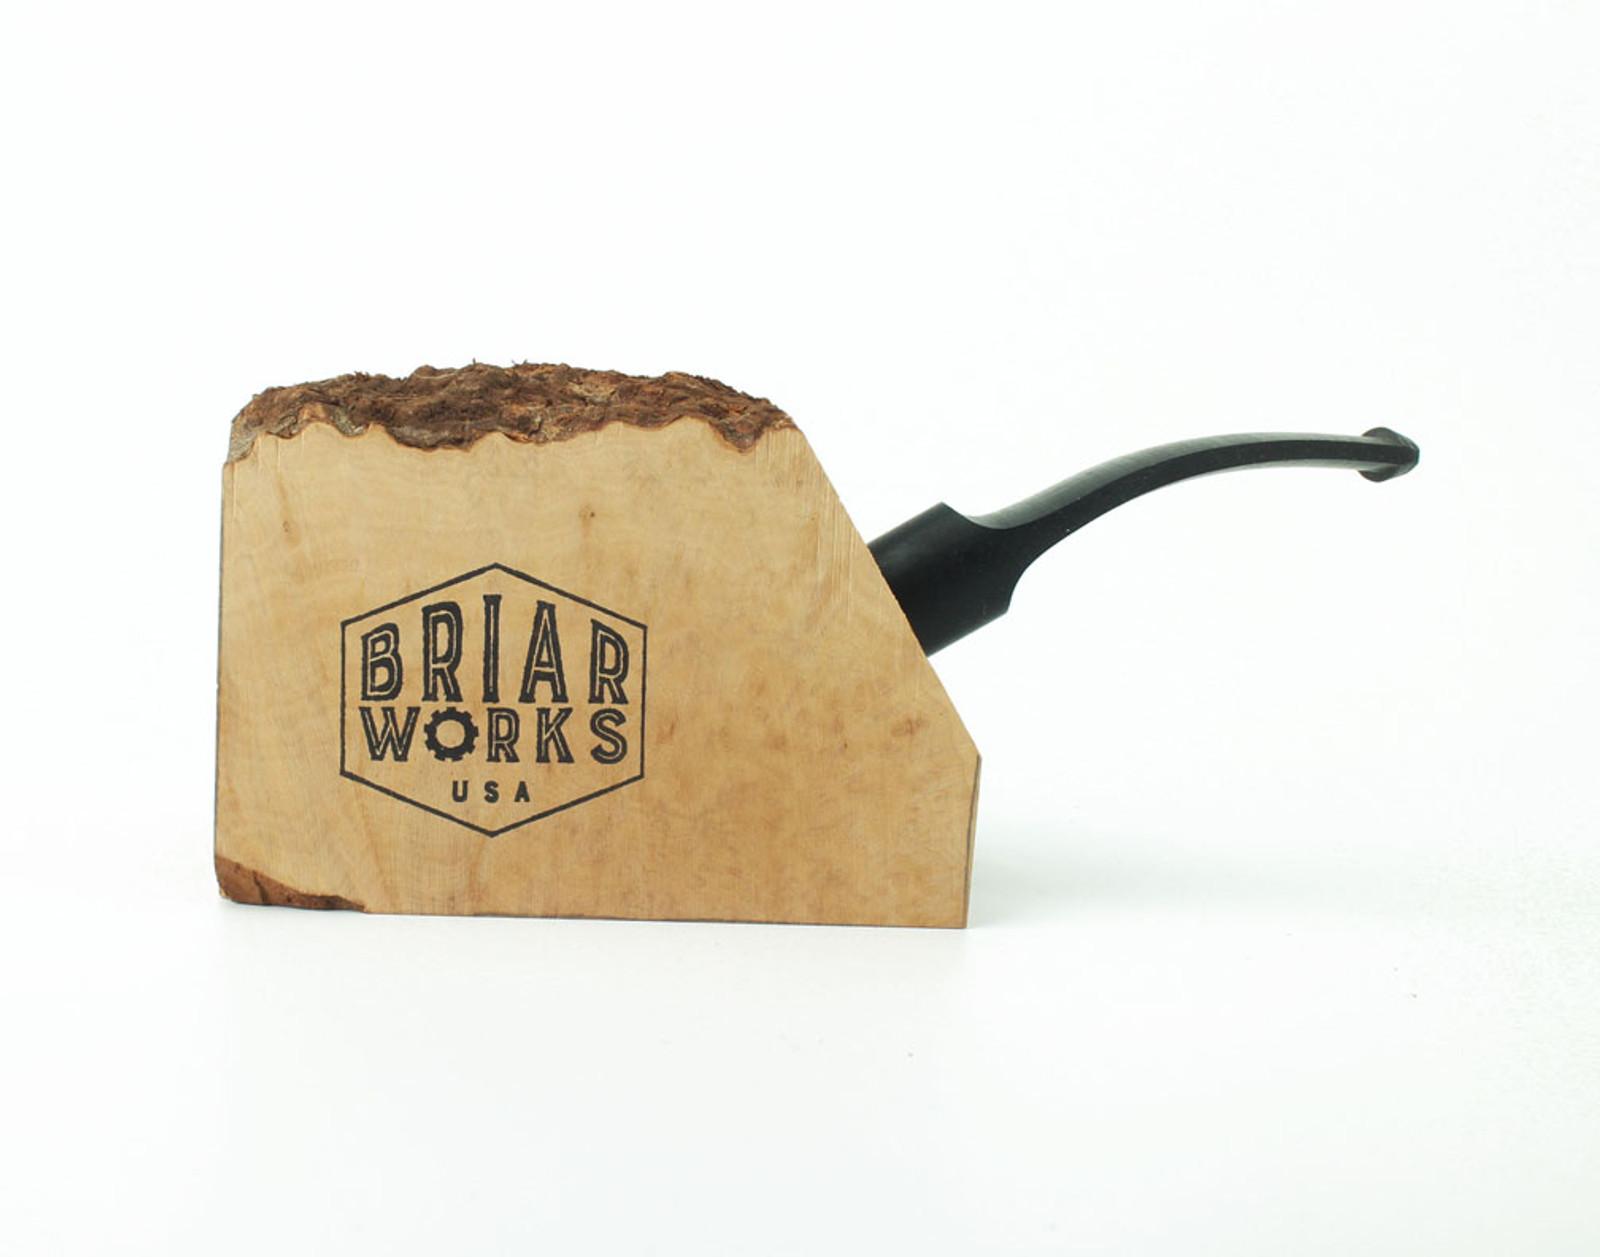 PKP-B - BriarWorks Pipe Kit - Plateaux w/ Bent Stem